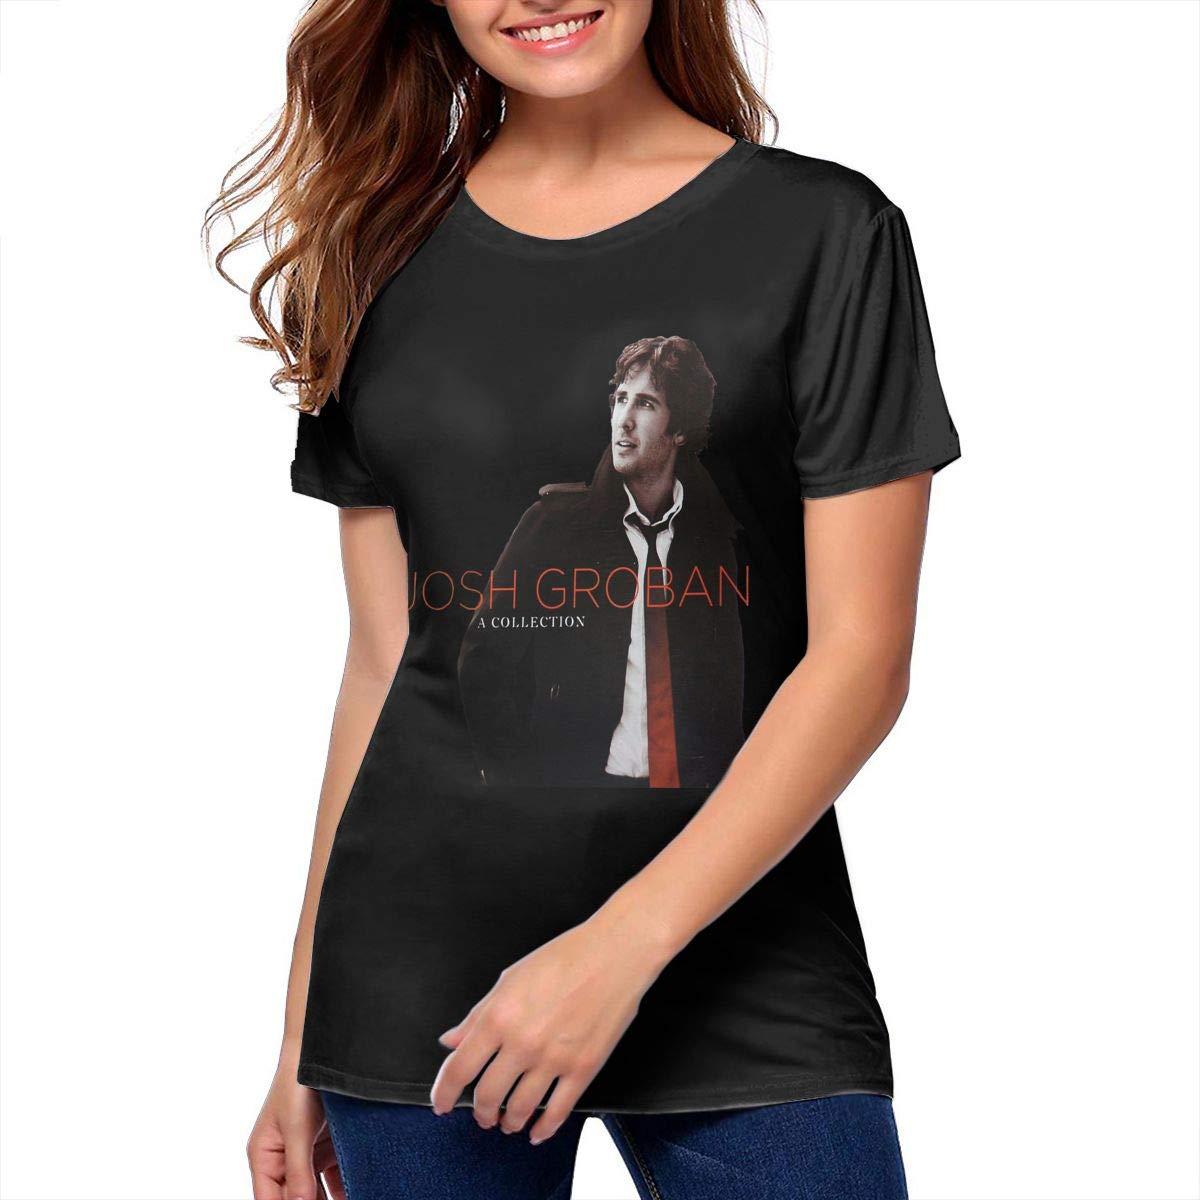 Josh Groban A Collection Stylish Music Band Short Sleeves T Shirts